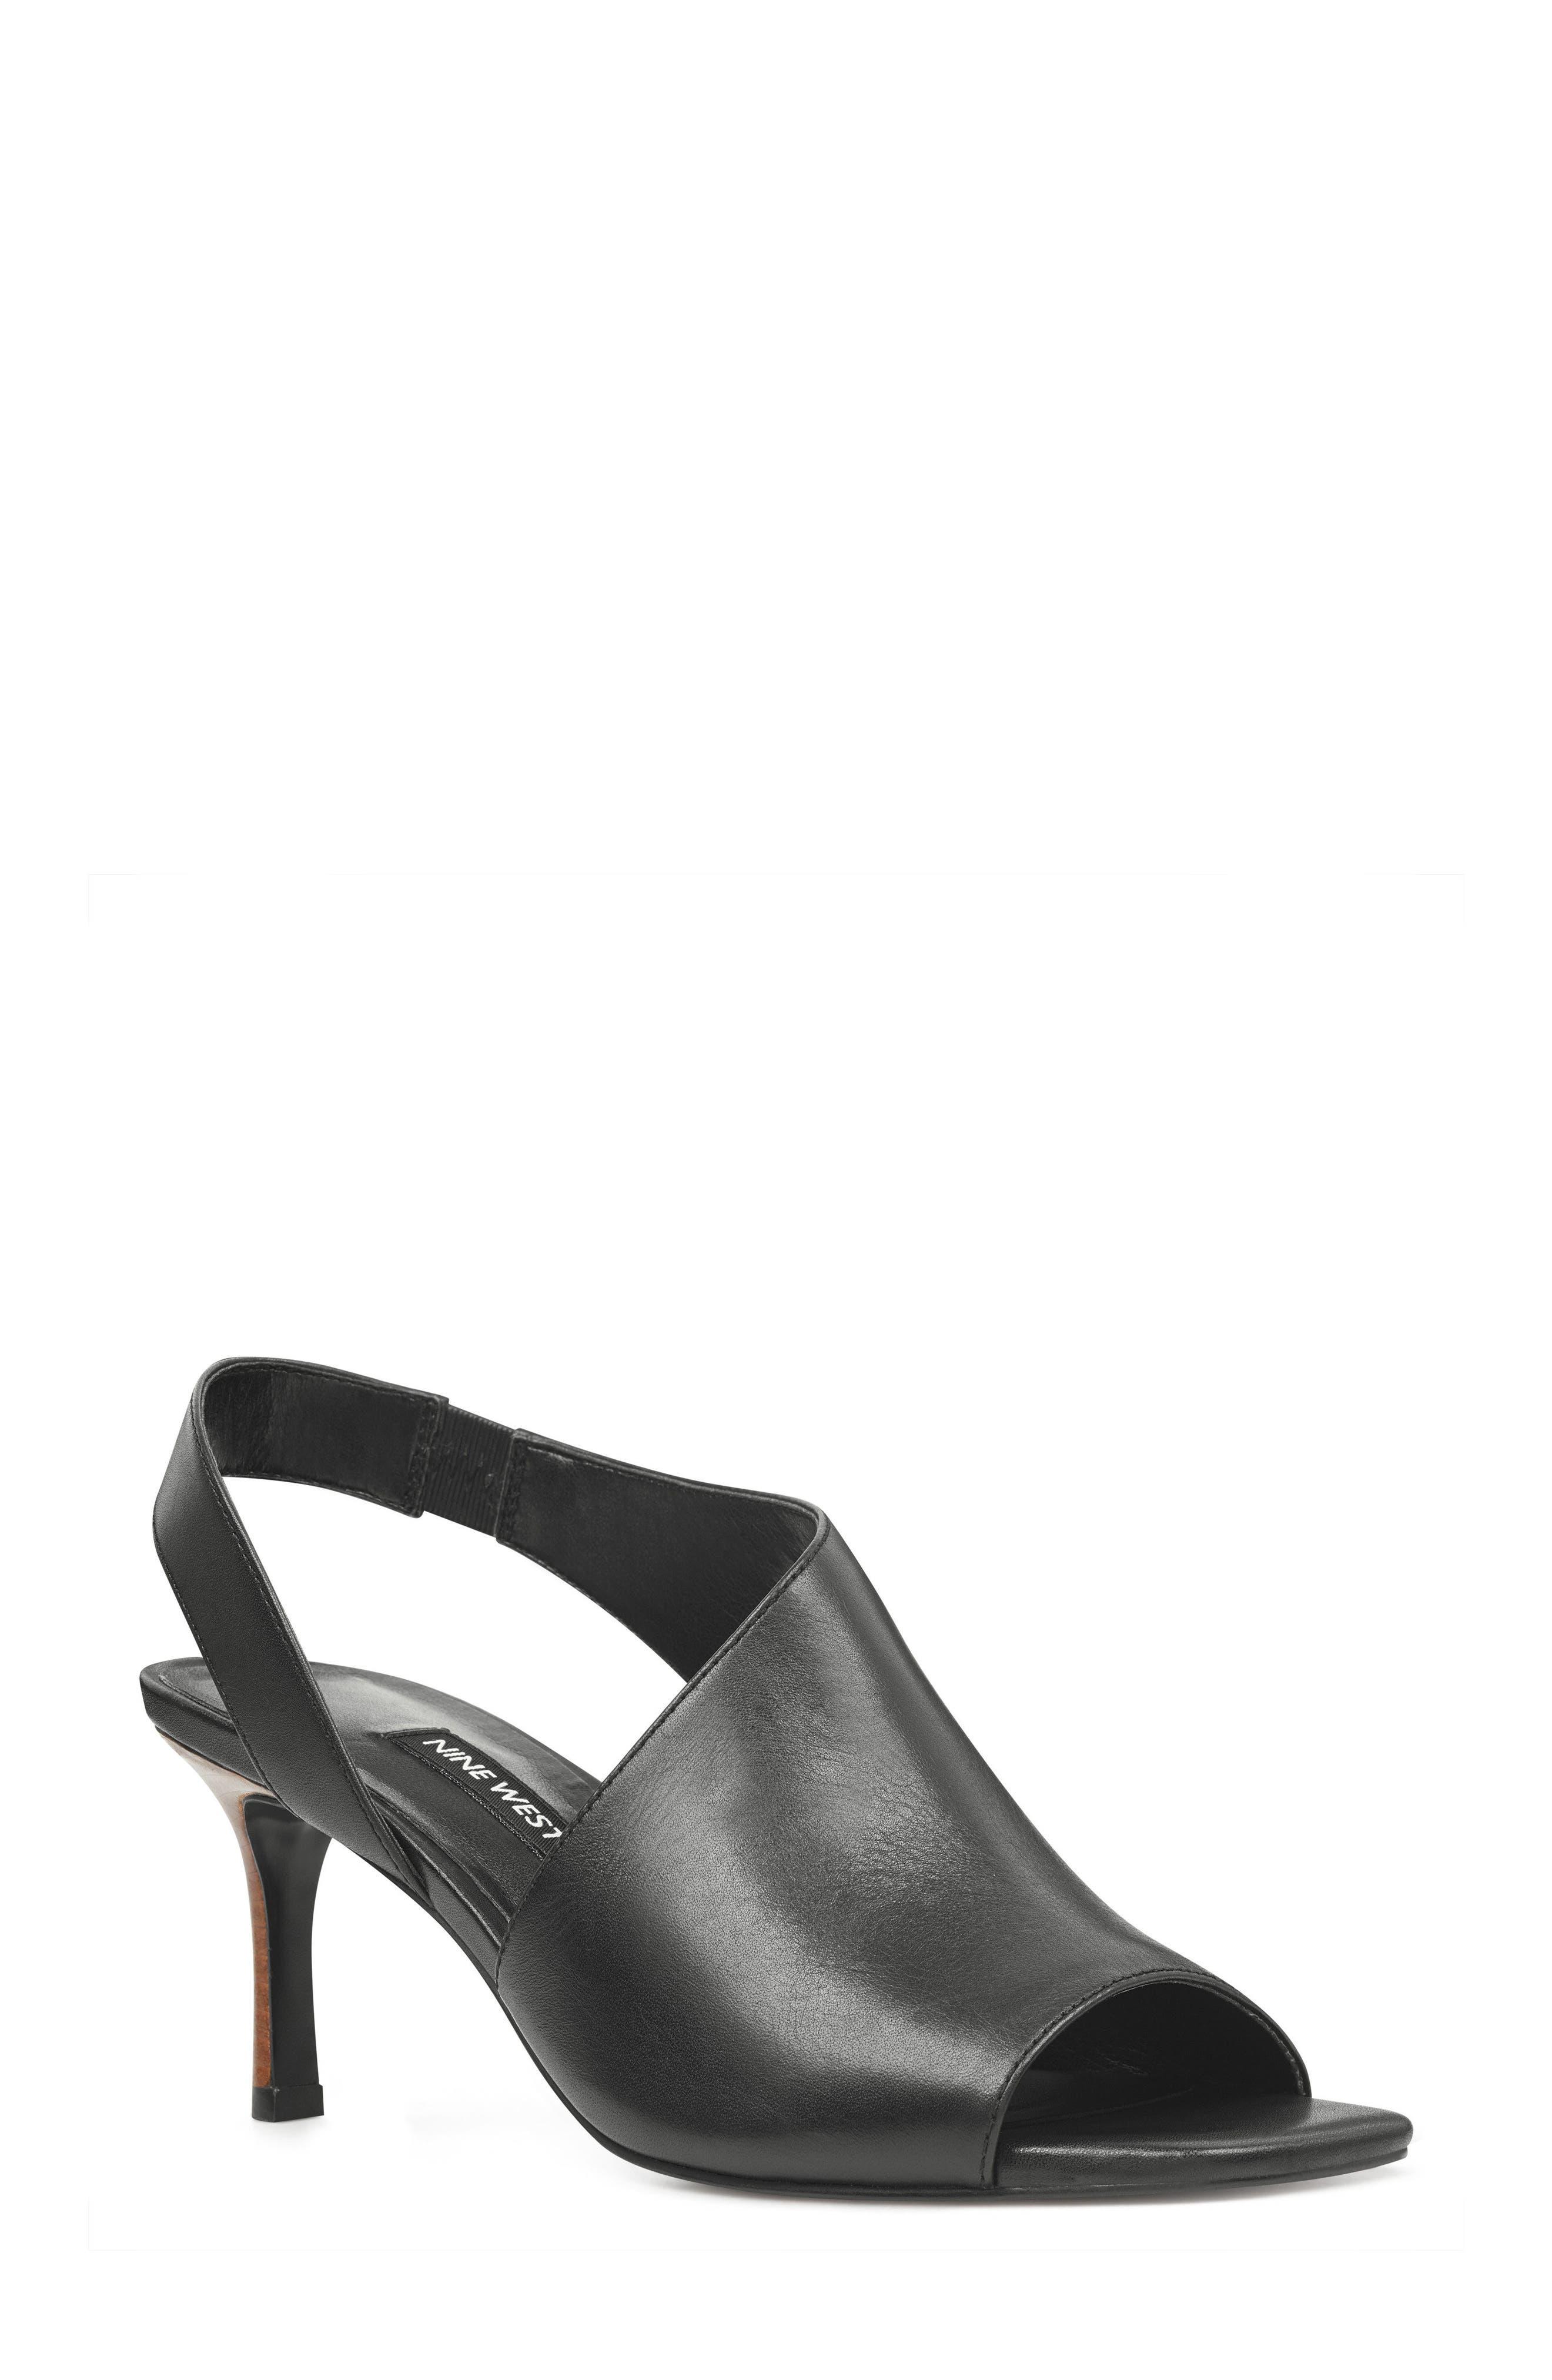 Orrus Asymmetrical Sandal,                             Main thumbnail 1, color,                             001